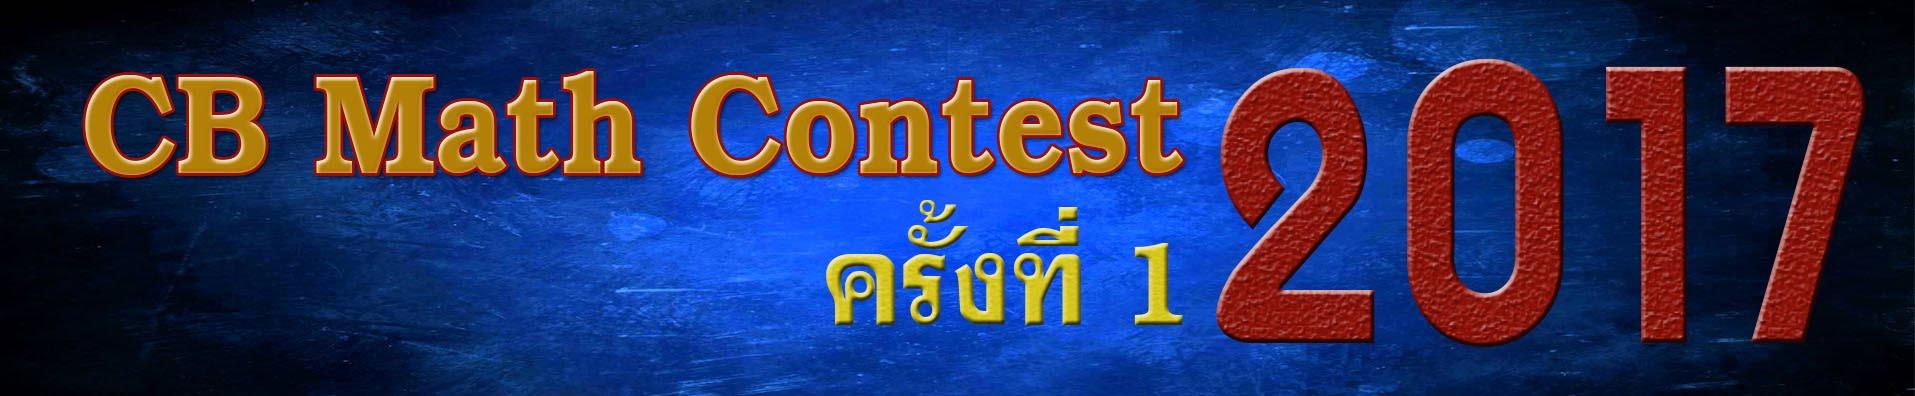 CB Math Contest 2017